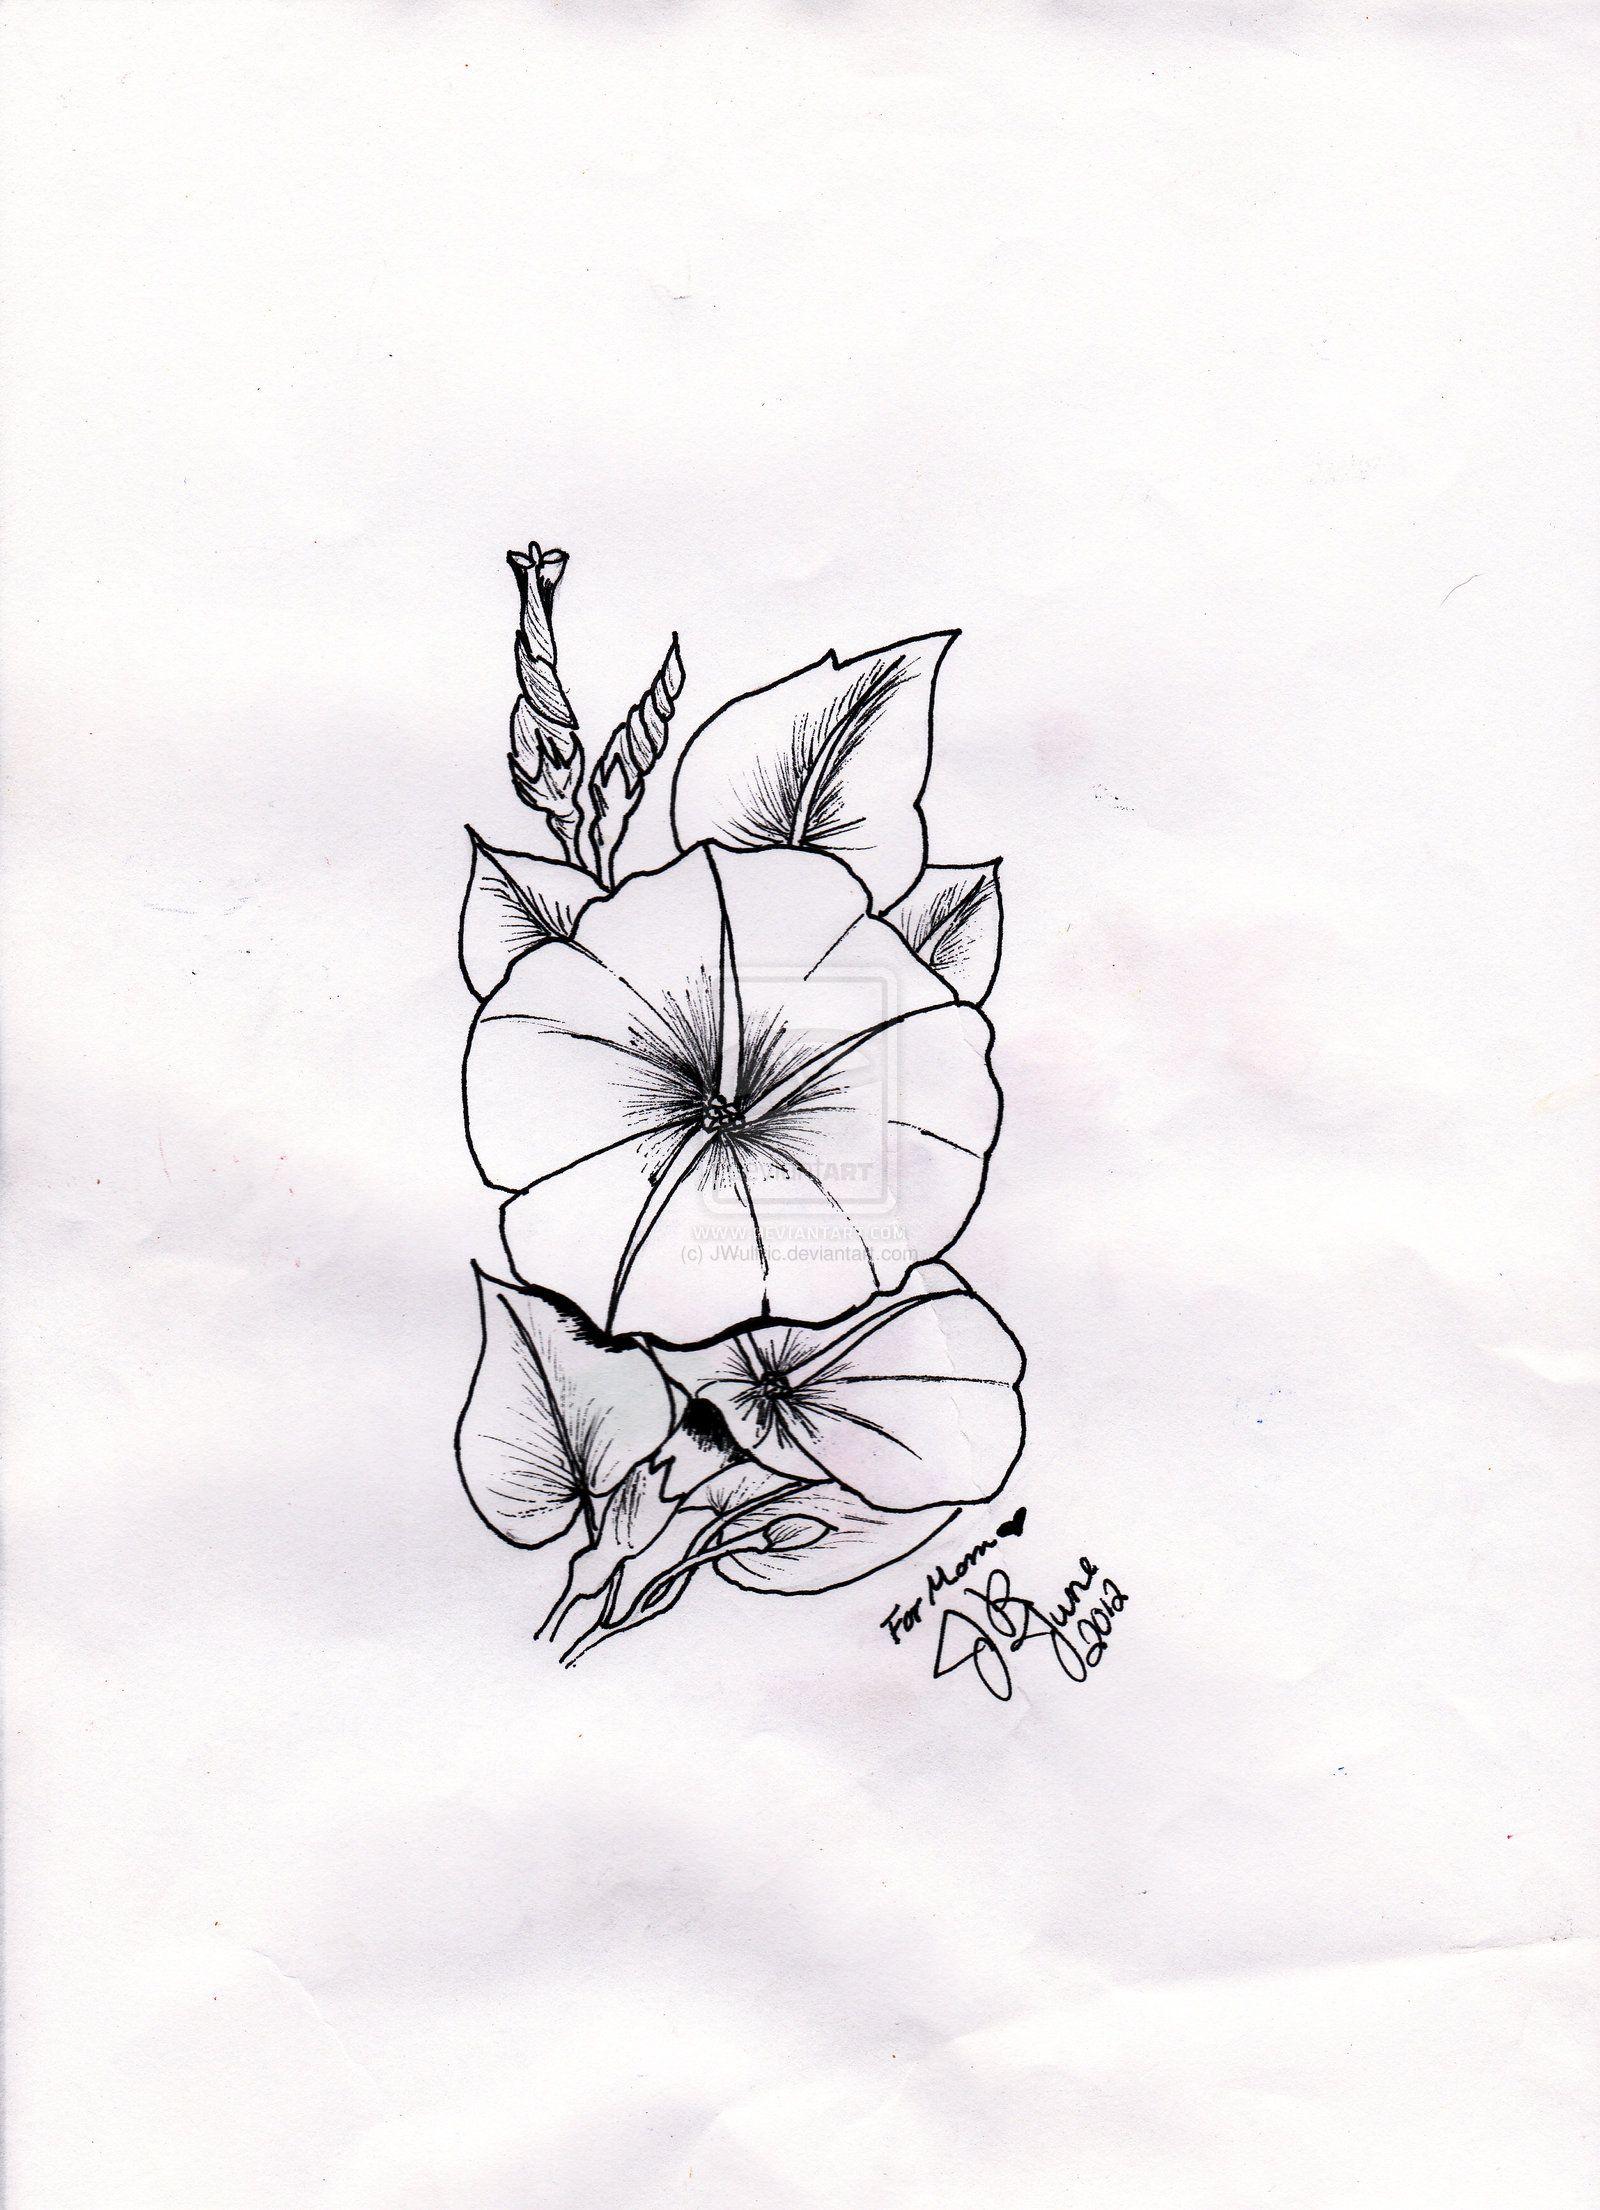 Moonflower Tattoo By Jwulfric On Deviantart Moon Flower Flower Vine Tattoos Morning Glory Flowers